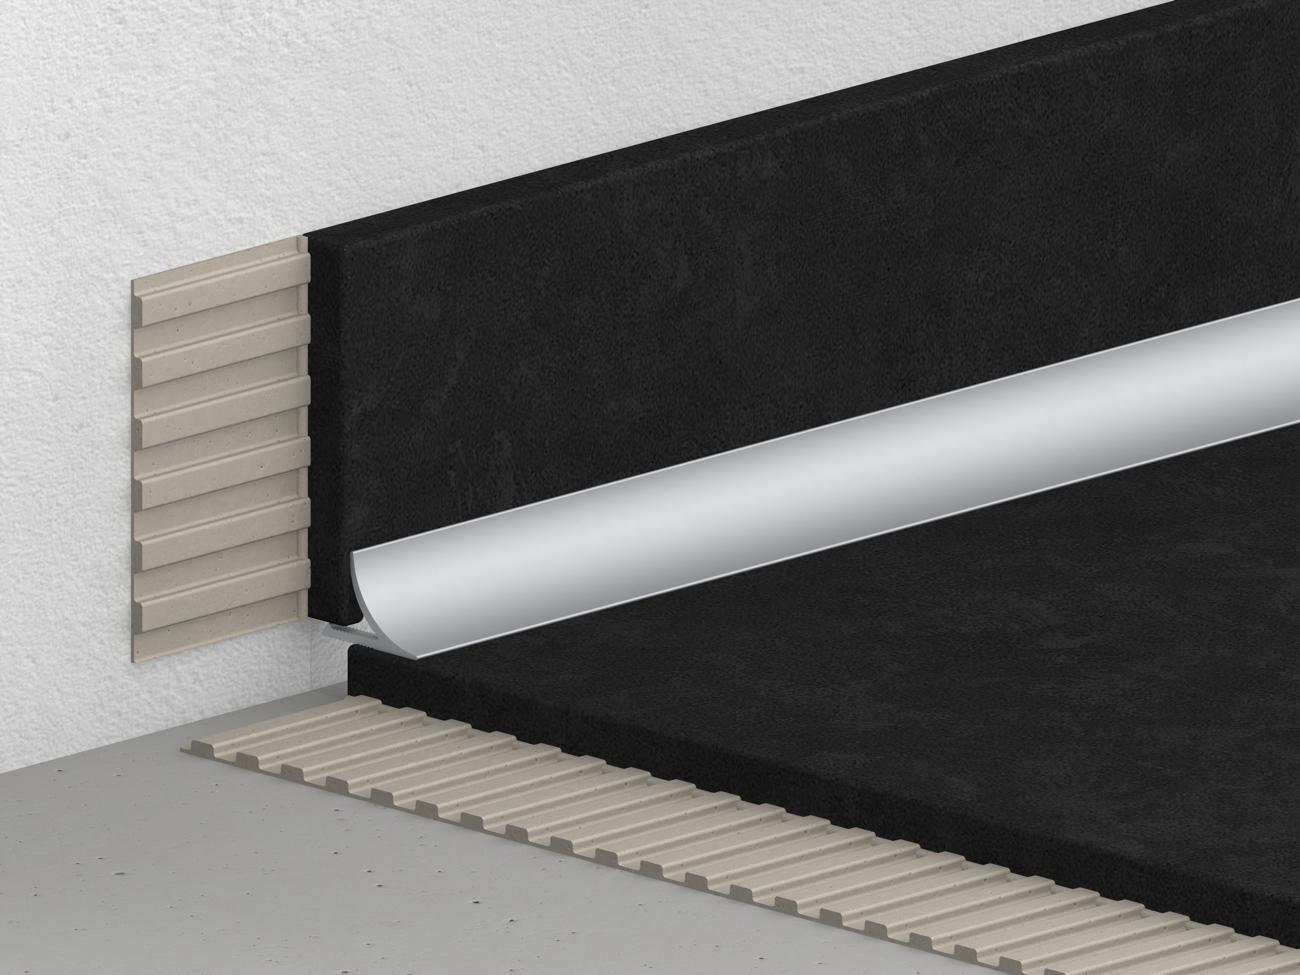 alferpro zum ersten mal in bologna. Black Bedroom Furniture Sets. Home Design Ideas